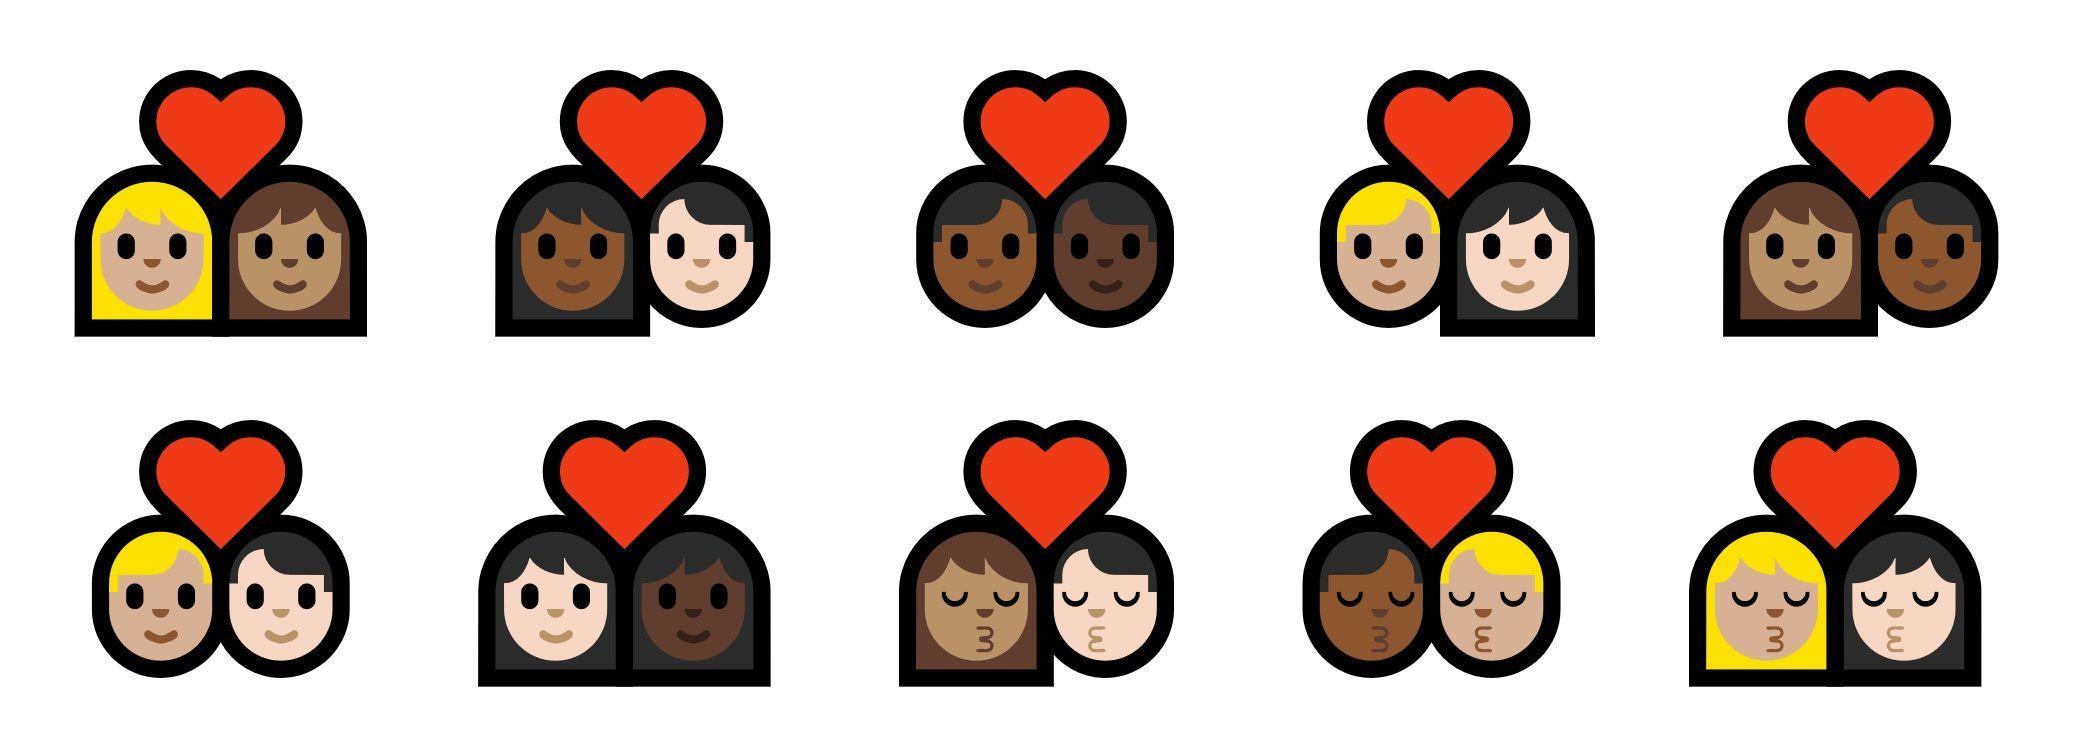 New Interracial Couple Emoji Coming To Windows Emoji Couples Emoji Interracial Couples